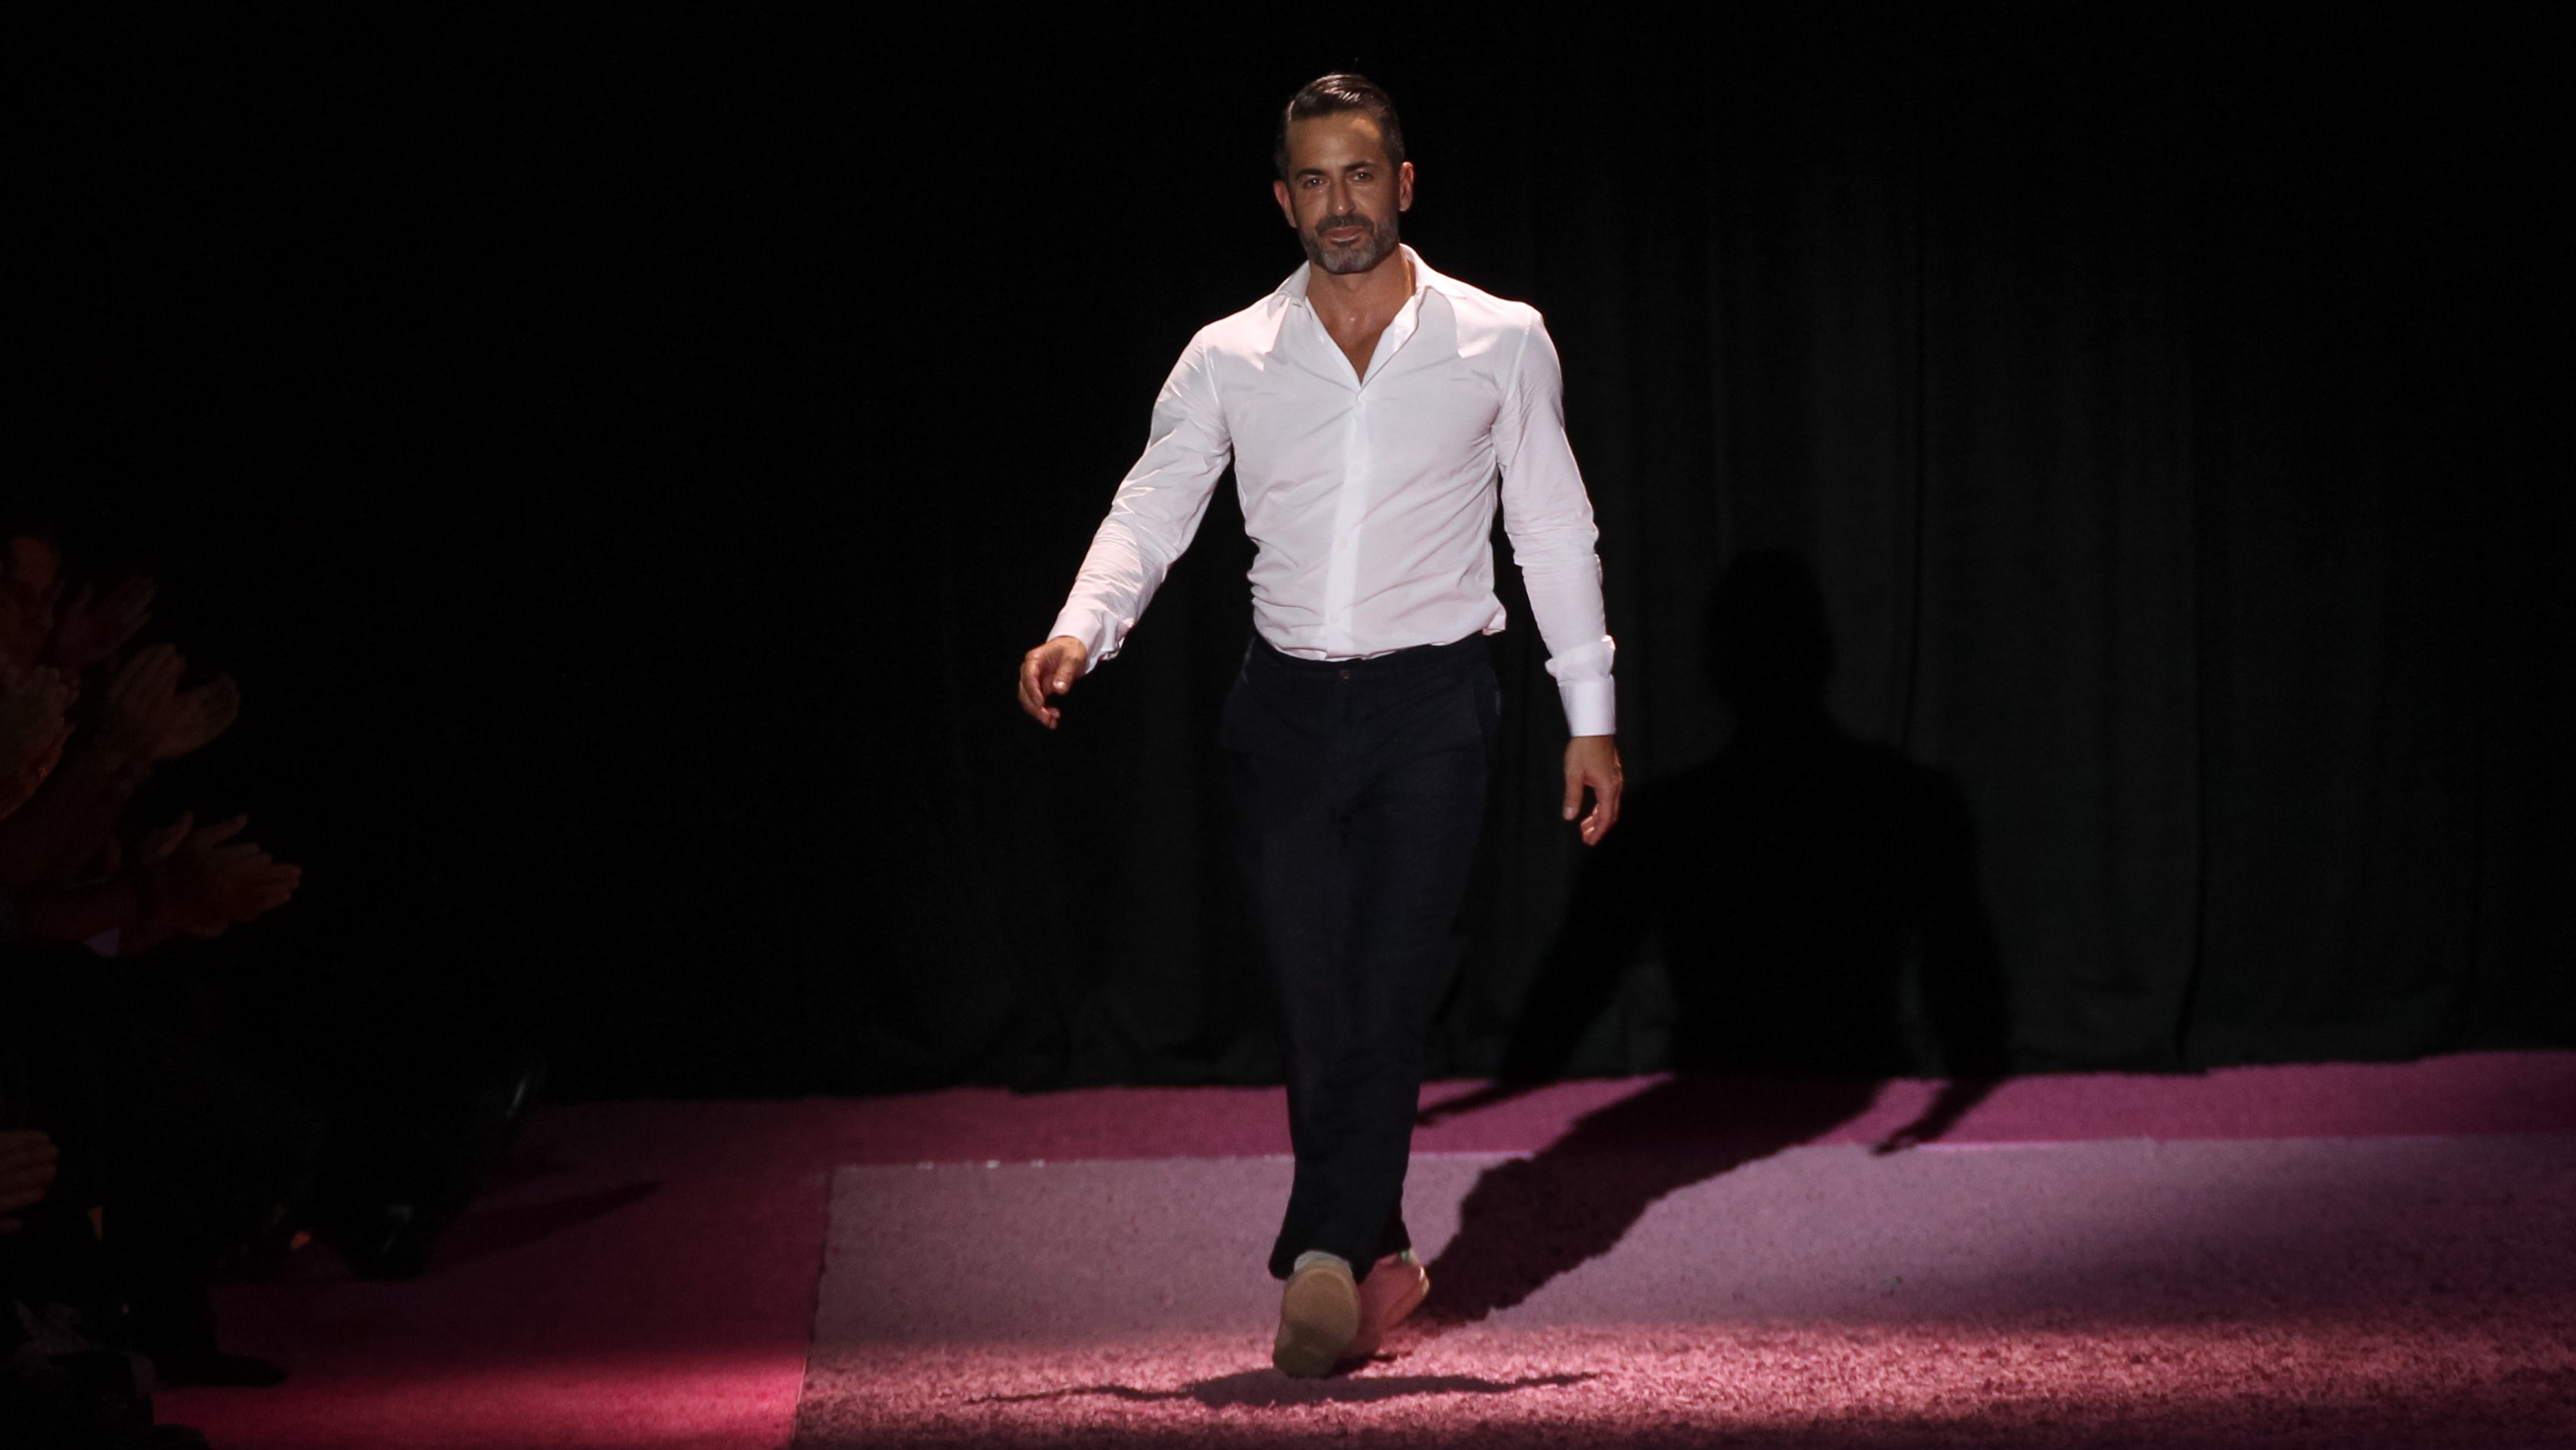 Marc Jacobs in 2015 | Source: Shutterstock